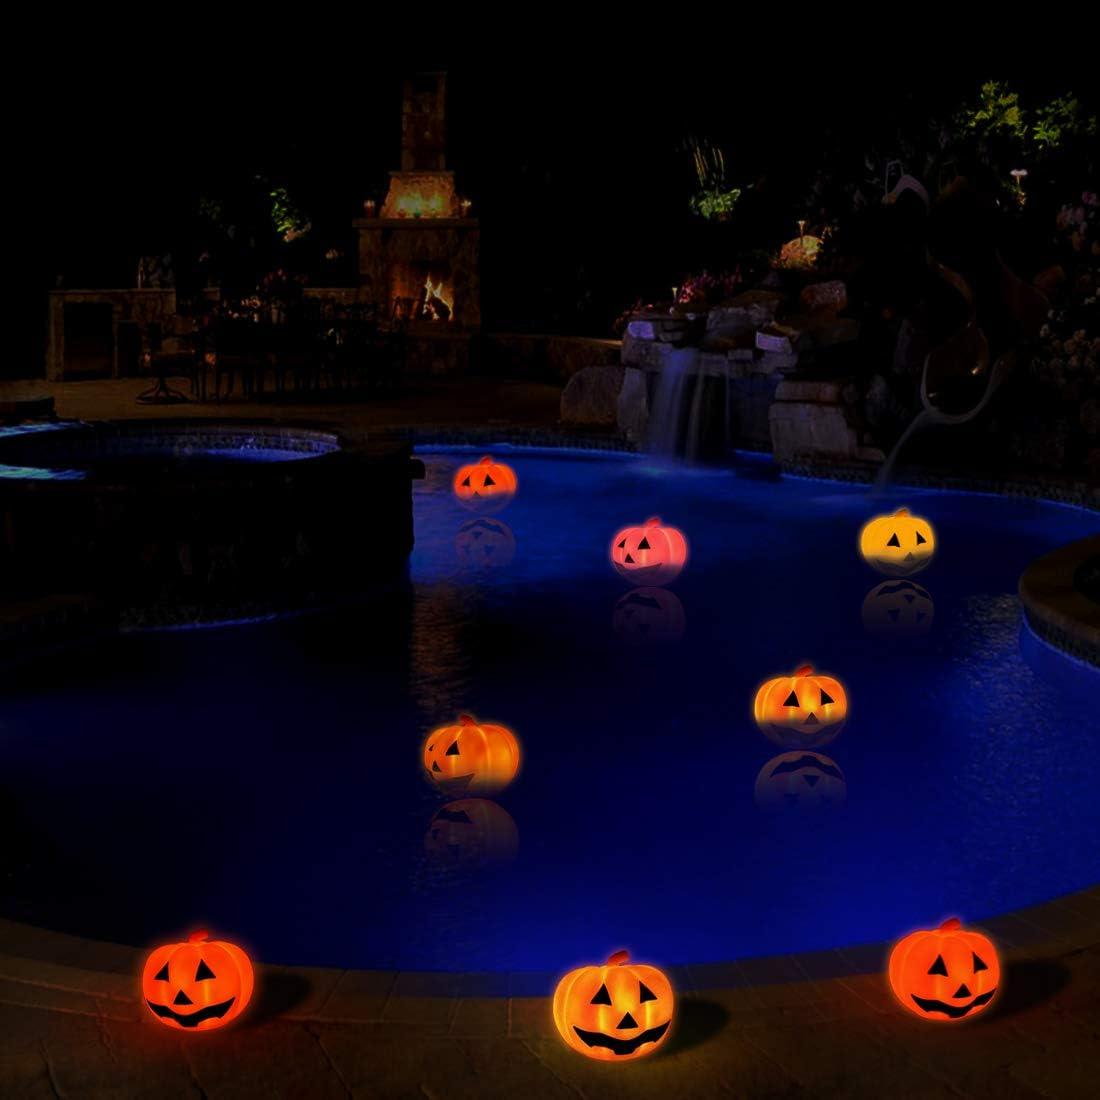 KingSom Halloween Luces De Calabaza,Luces Decorativas de Halloween con Cara Divertida,IP67 Impermeable,Colores Intermitentes Ligero Halloween Luces LED para Acci/ón de Gracias Fiesta de Halloween(4pcs)